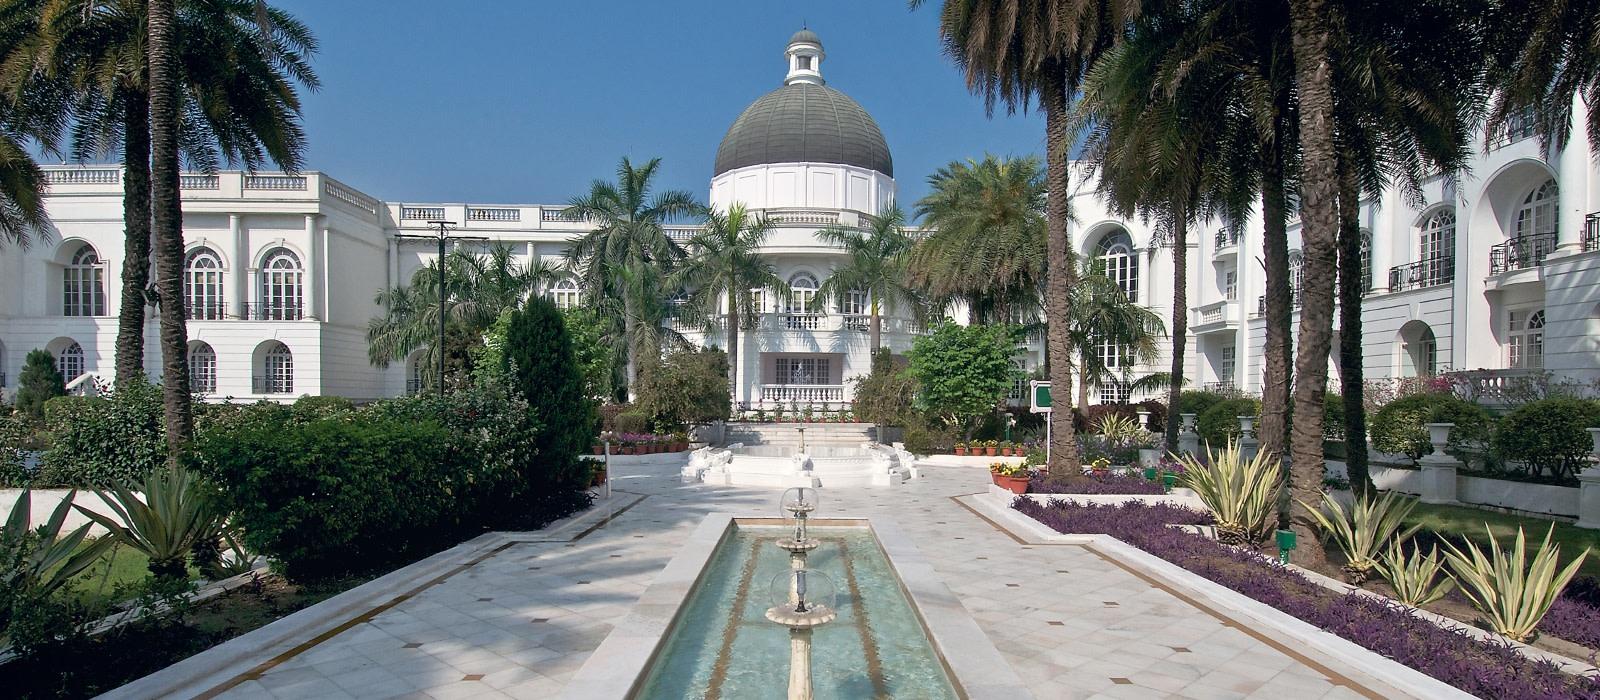 Hotel Taj Mahal Lucknow North India